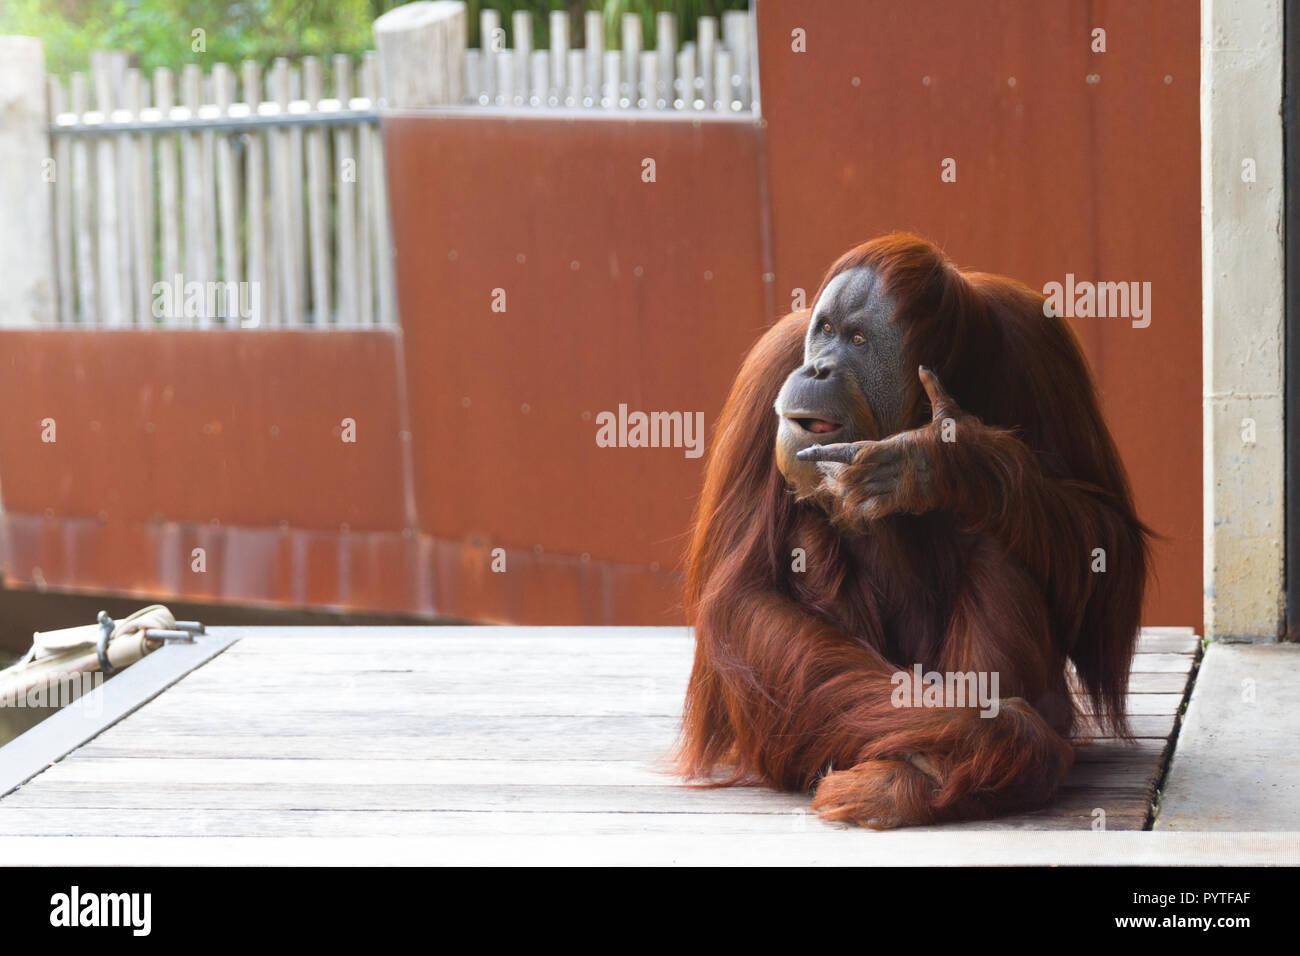 Orangutan sitting on platform, looking to the right, thinking. - Stock Image